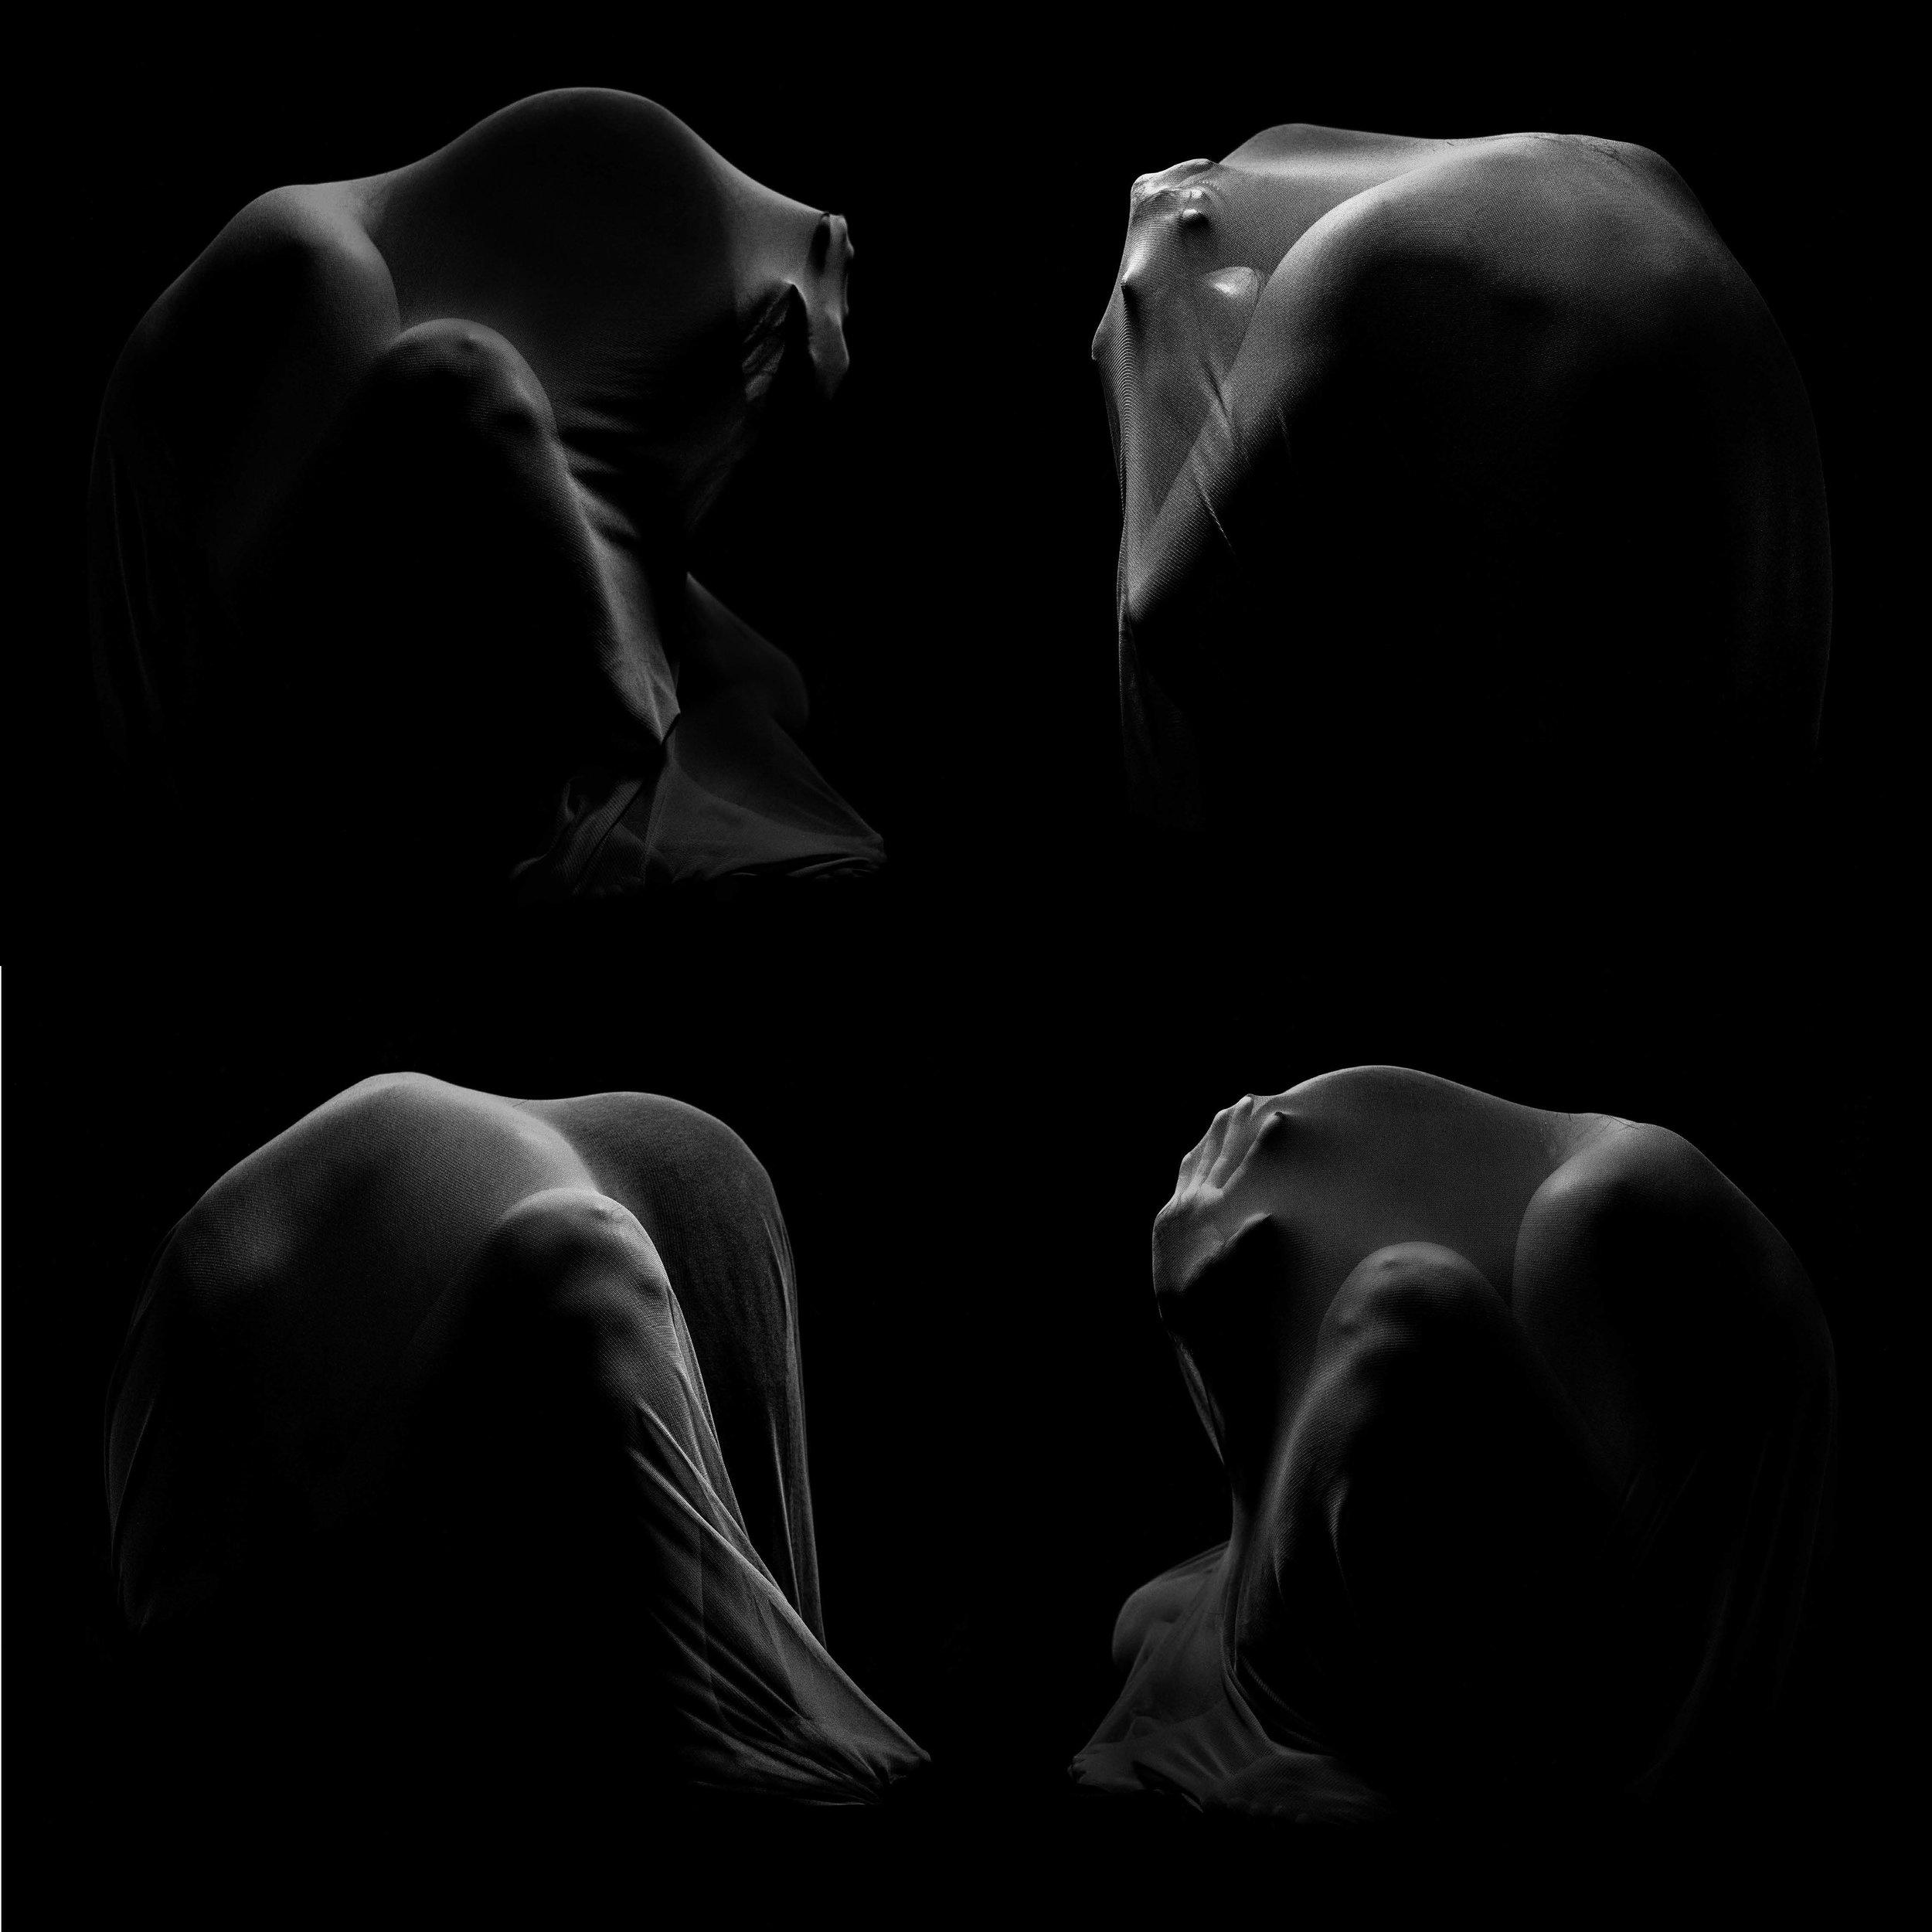 human emotions 04 collage.jpg